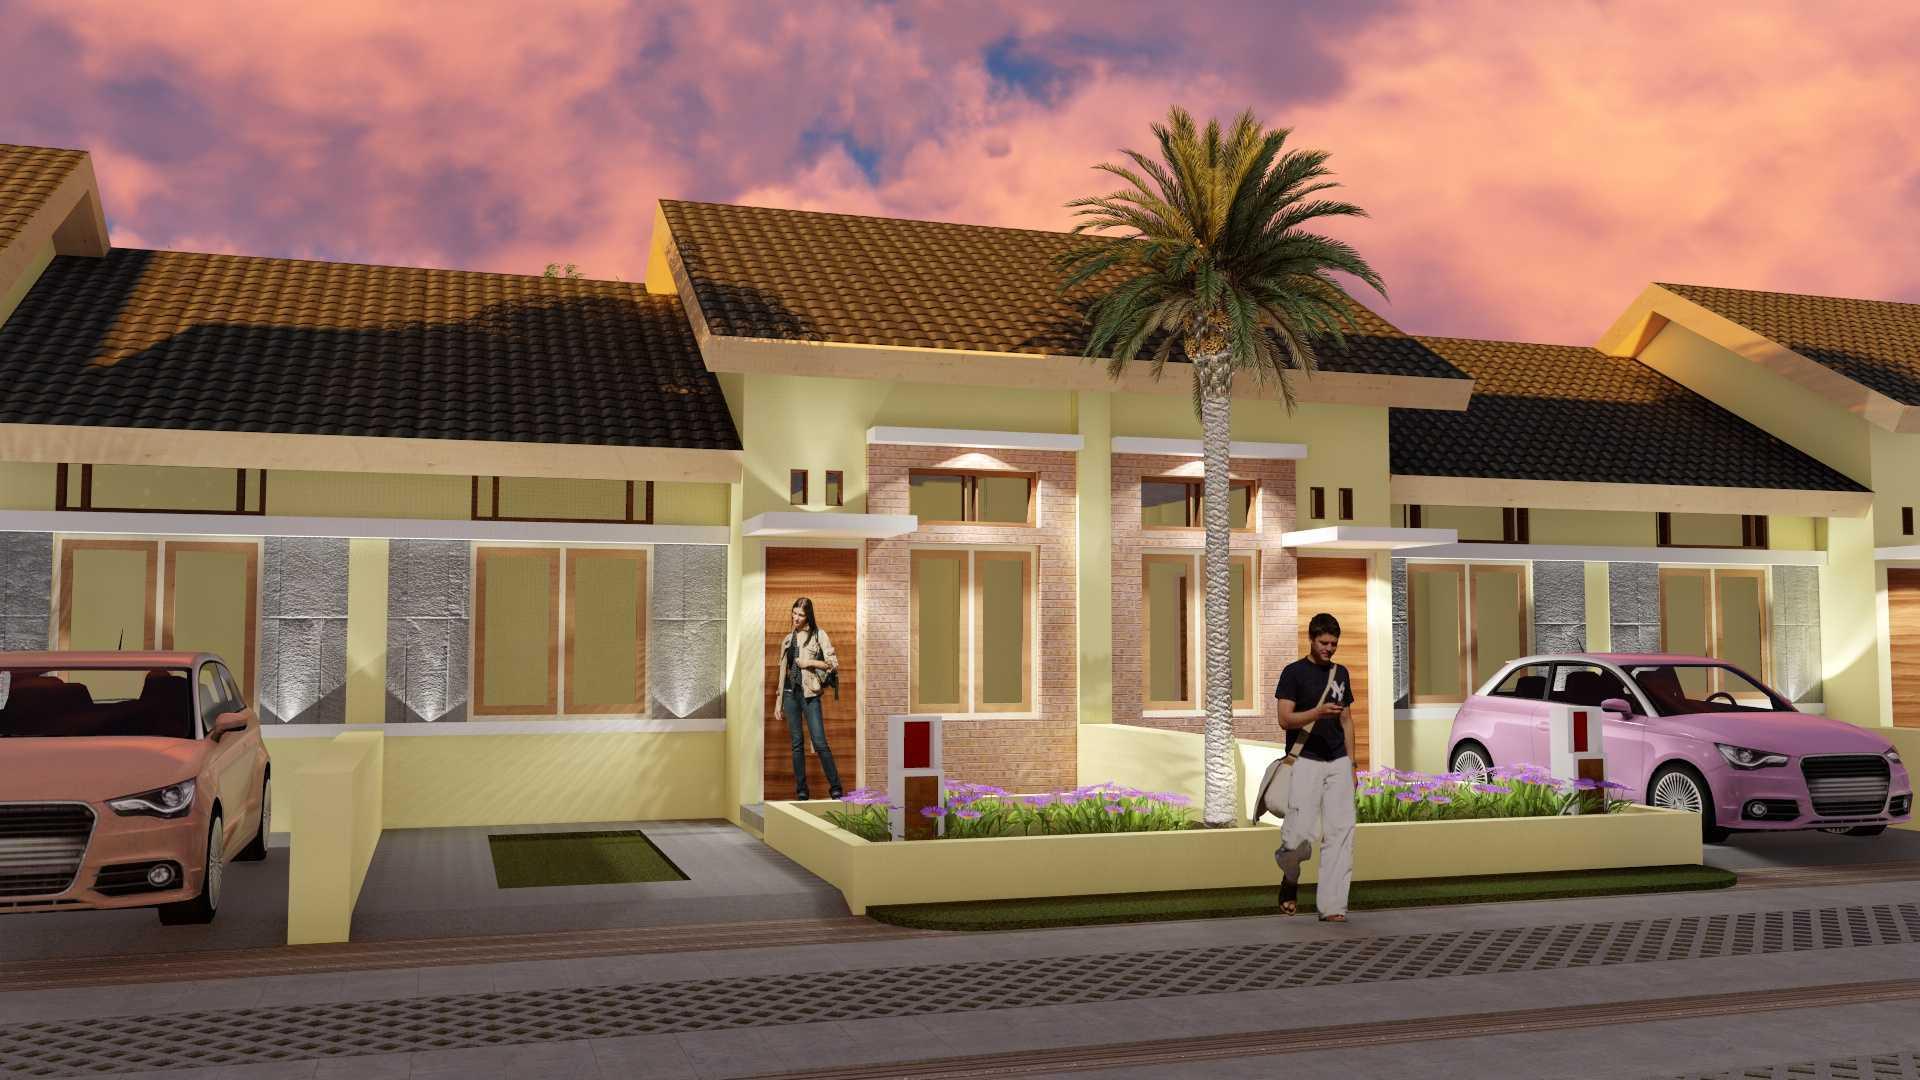 Muhammad Imaaduddin  Pakis Hills Residence Bogor Bogor, Jawa Barat, Indonesia Bogor, Jawa Barat, Indonesia Muhammad-Imaaduddin-Pakis-Hills-Residence-Bogor  62183